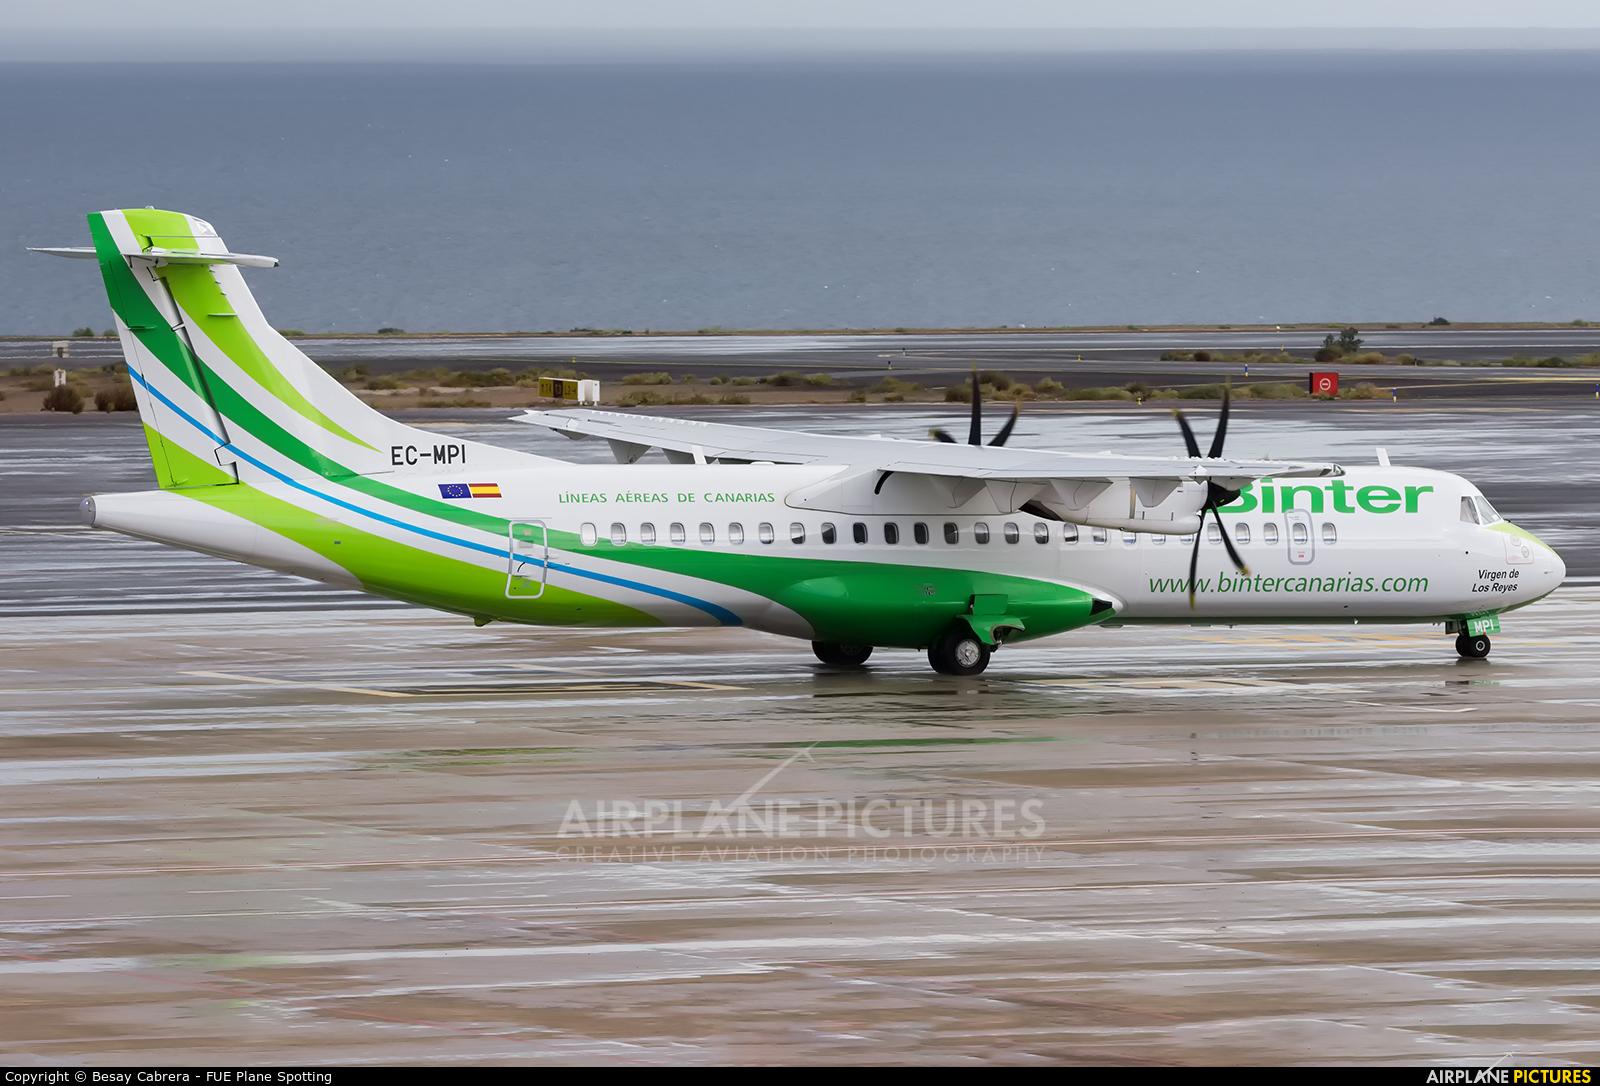 Binter Canarias EC-MPI aircraft at Fuerteventura - Puerto del Rosario